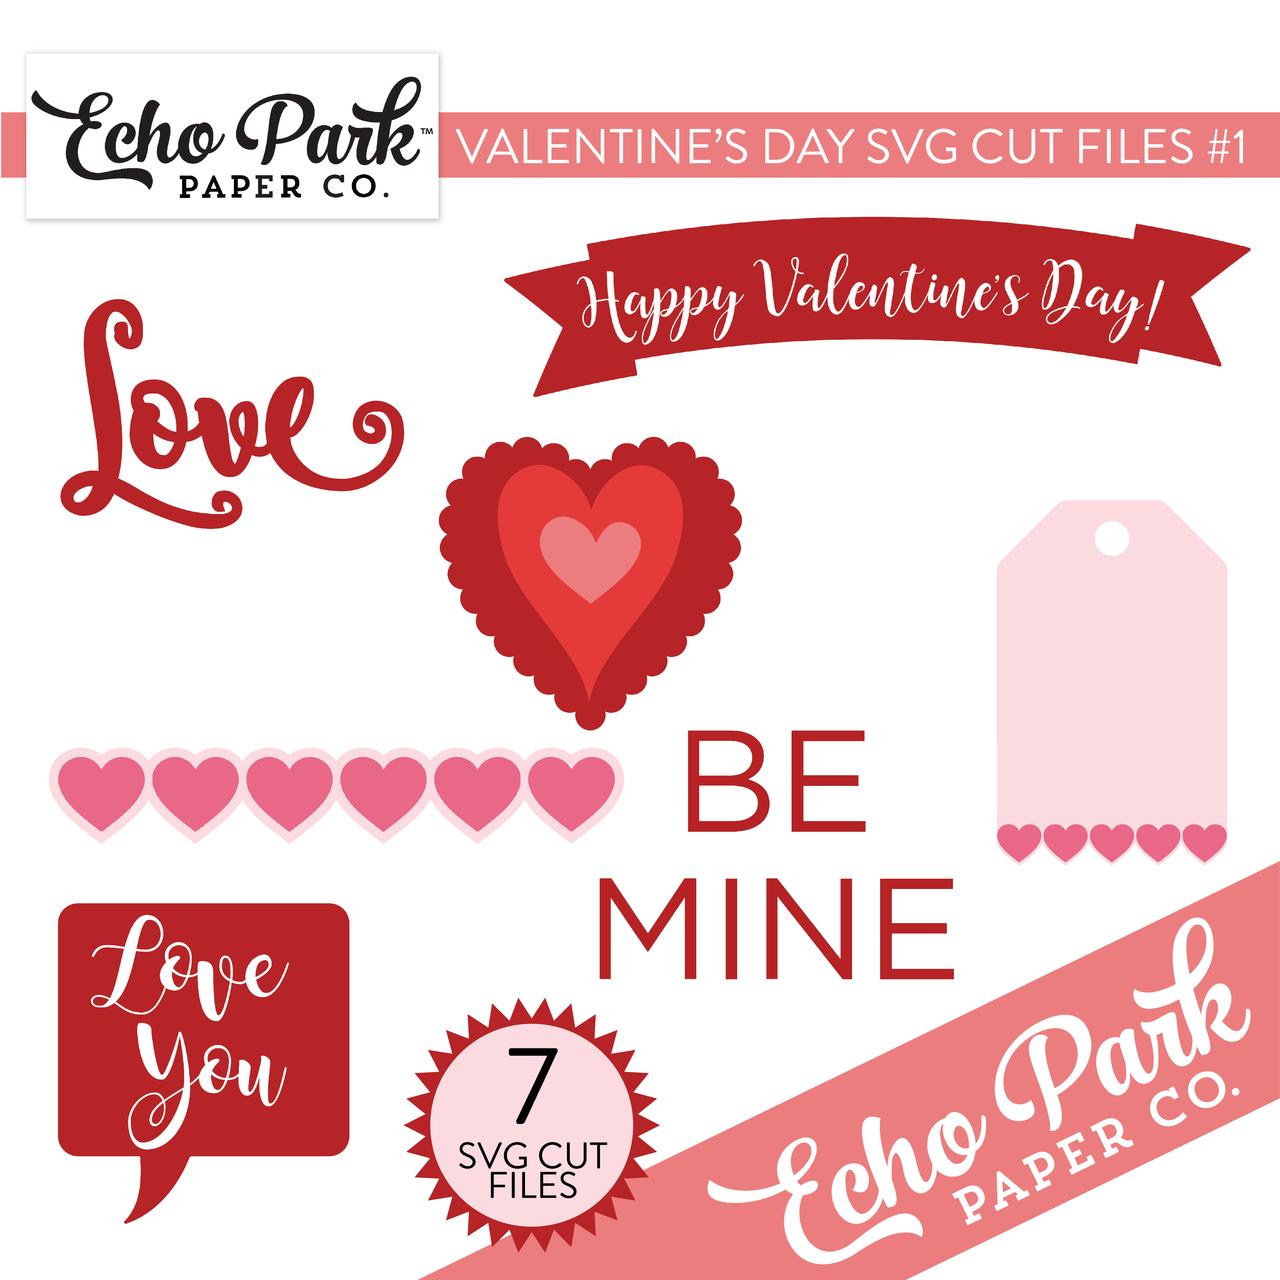 Valentines SVG Cut Files #1